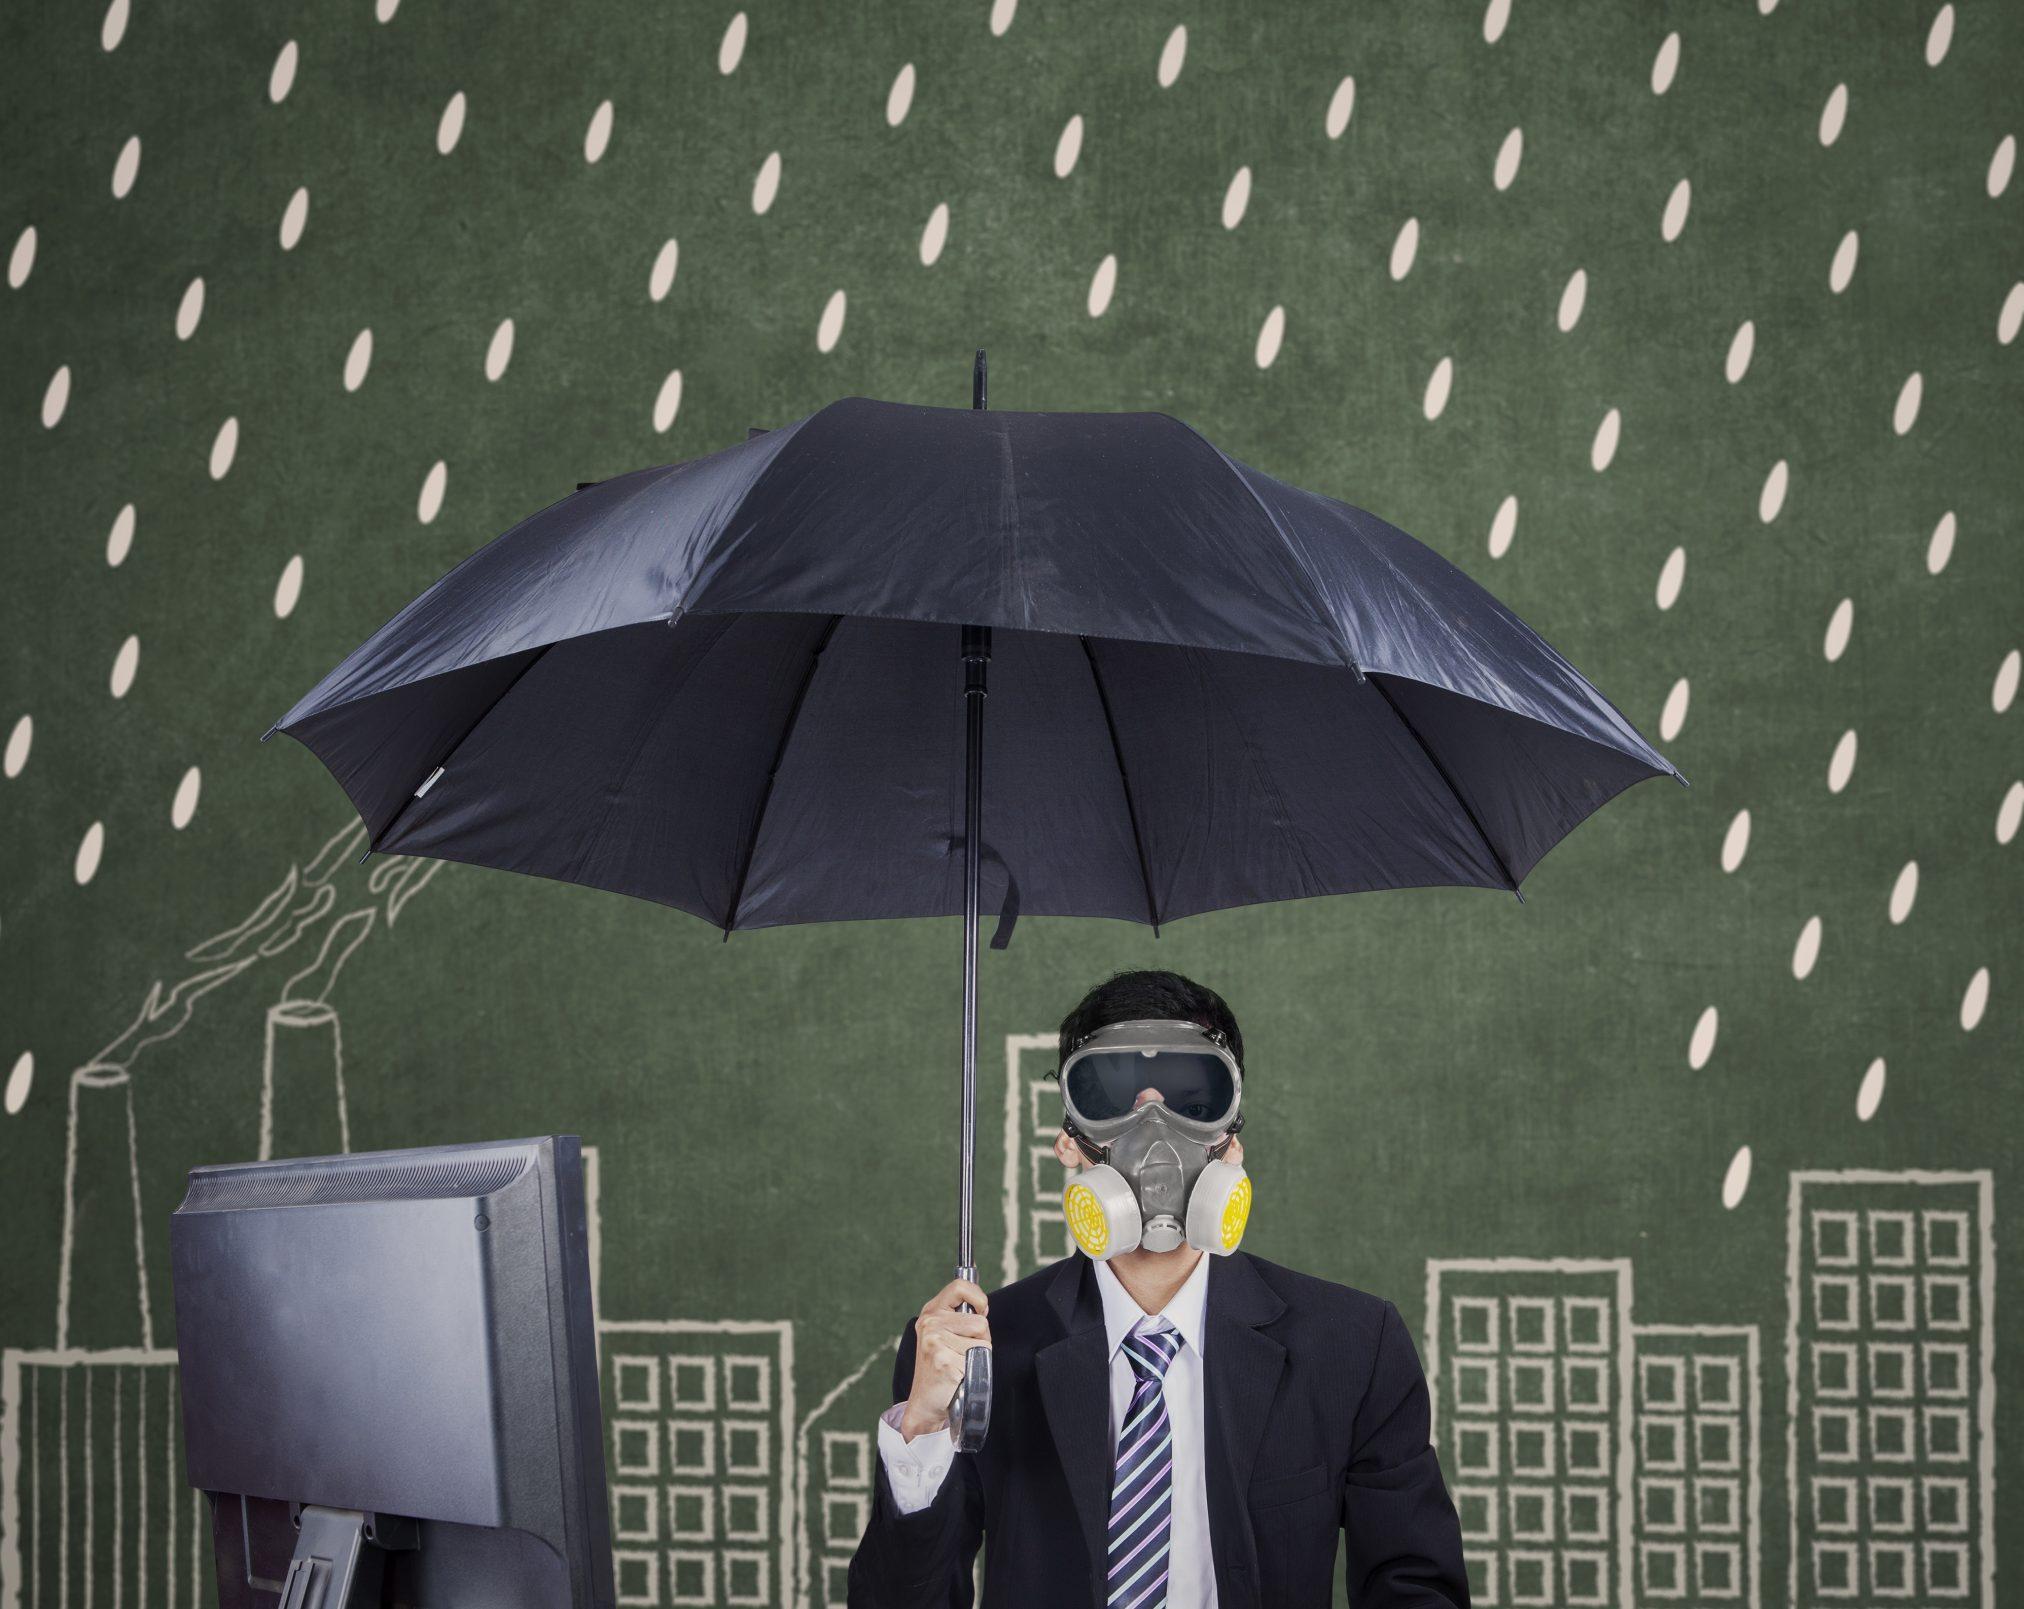 toxic workplace rain